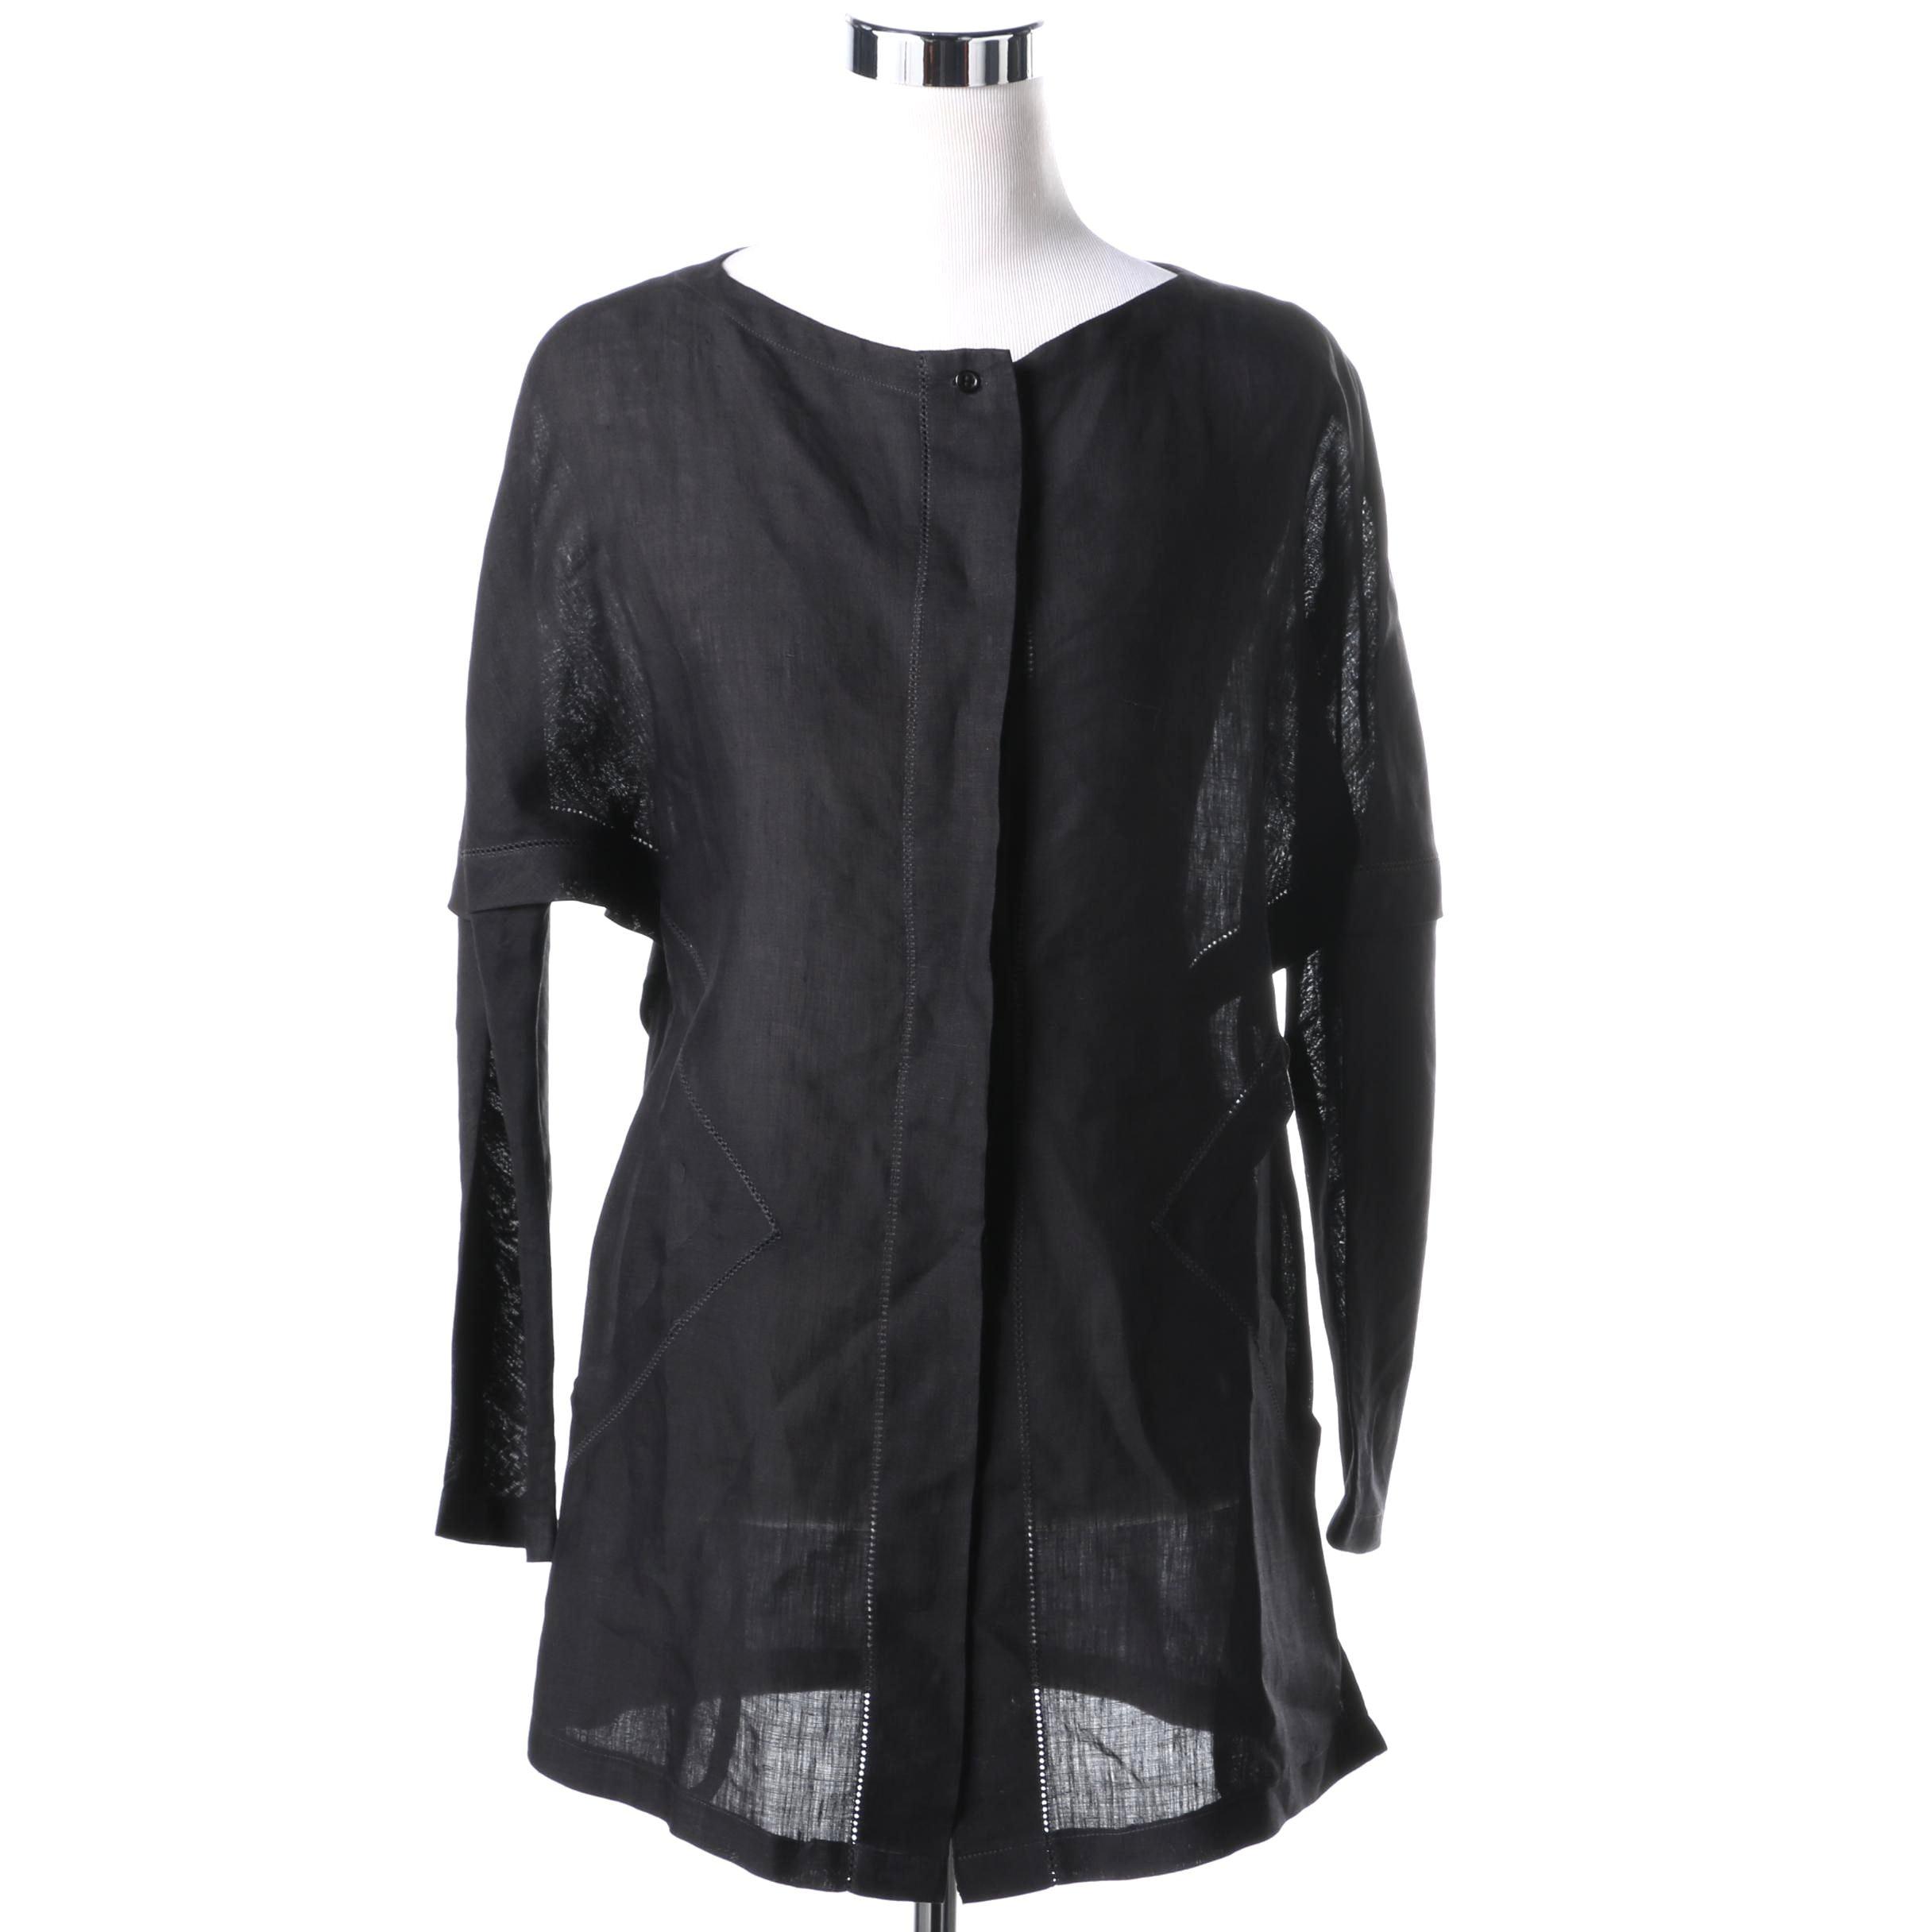 Vintage Collectible Shamask Original Women's Linen Tunic